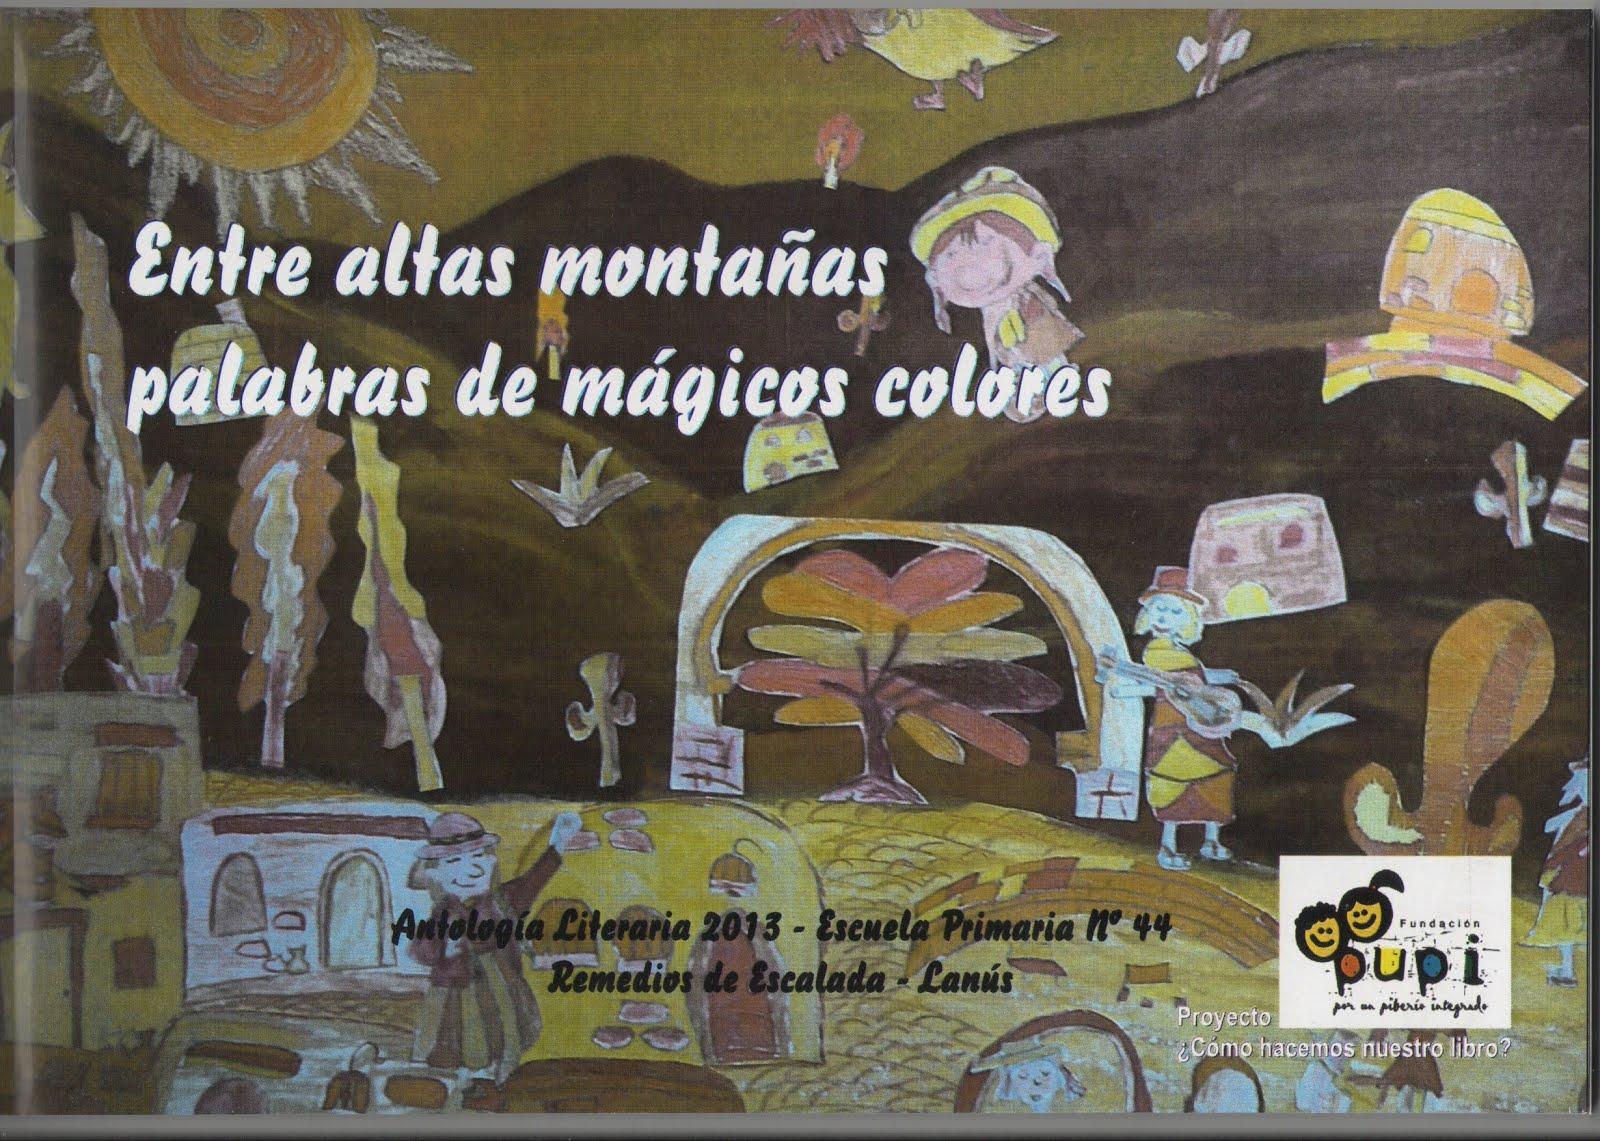 Entre altas montañas palabras de mágicos colores